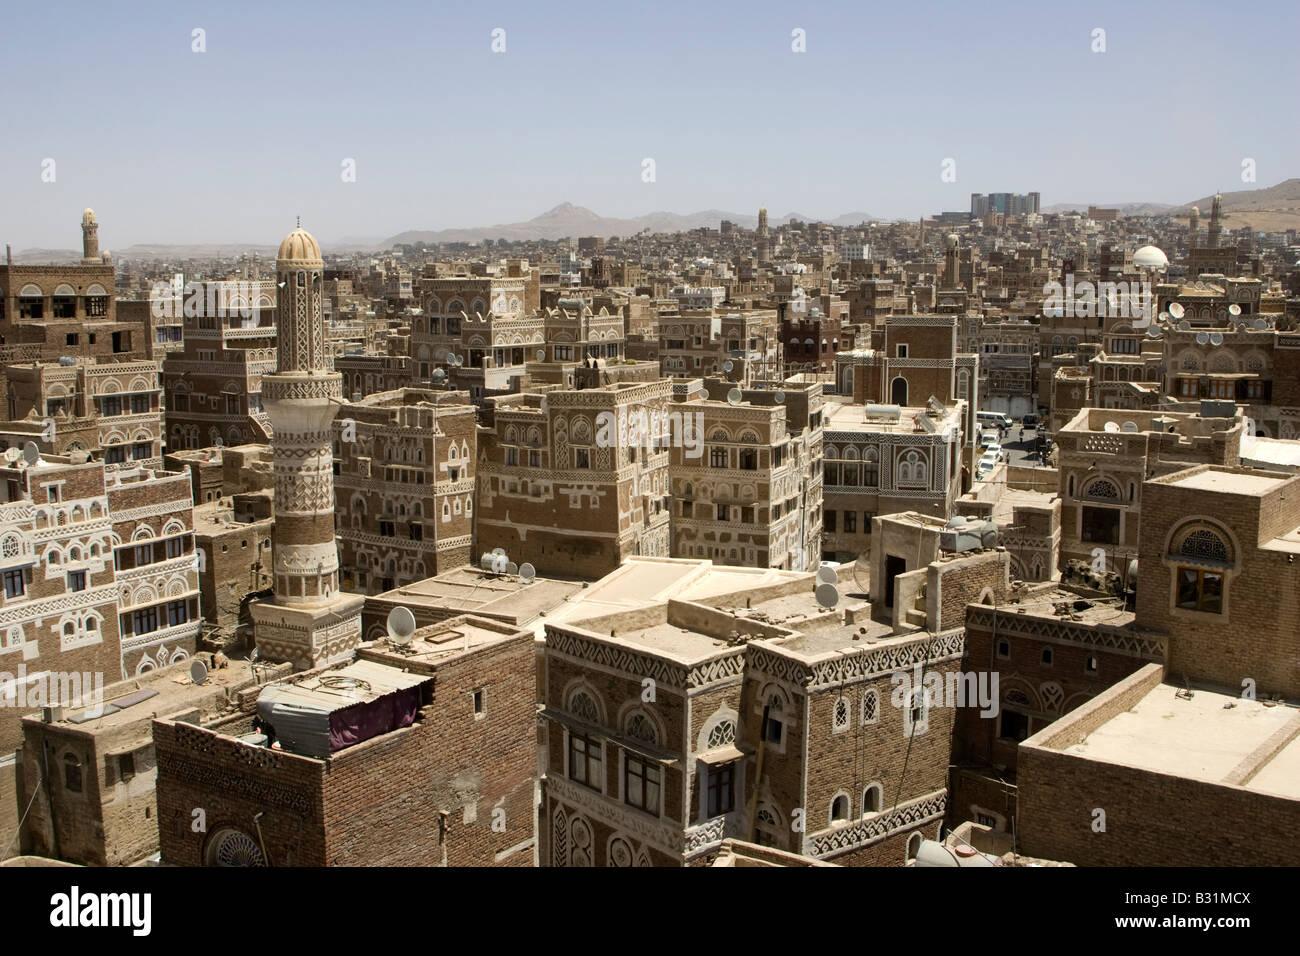 Sanaa the ancient capital city of Yemen - Stock Image